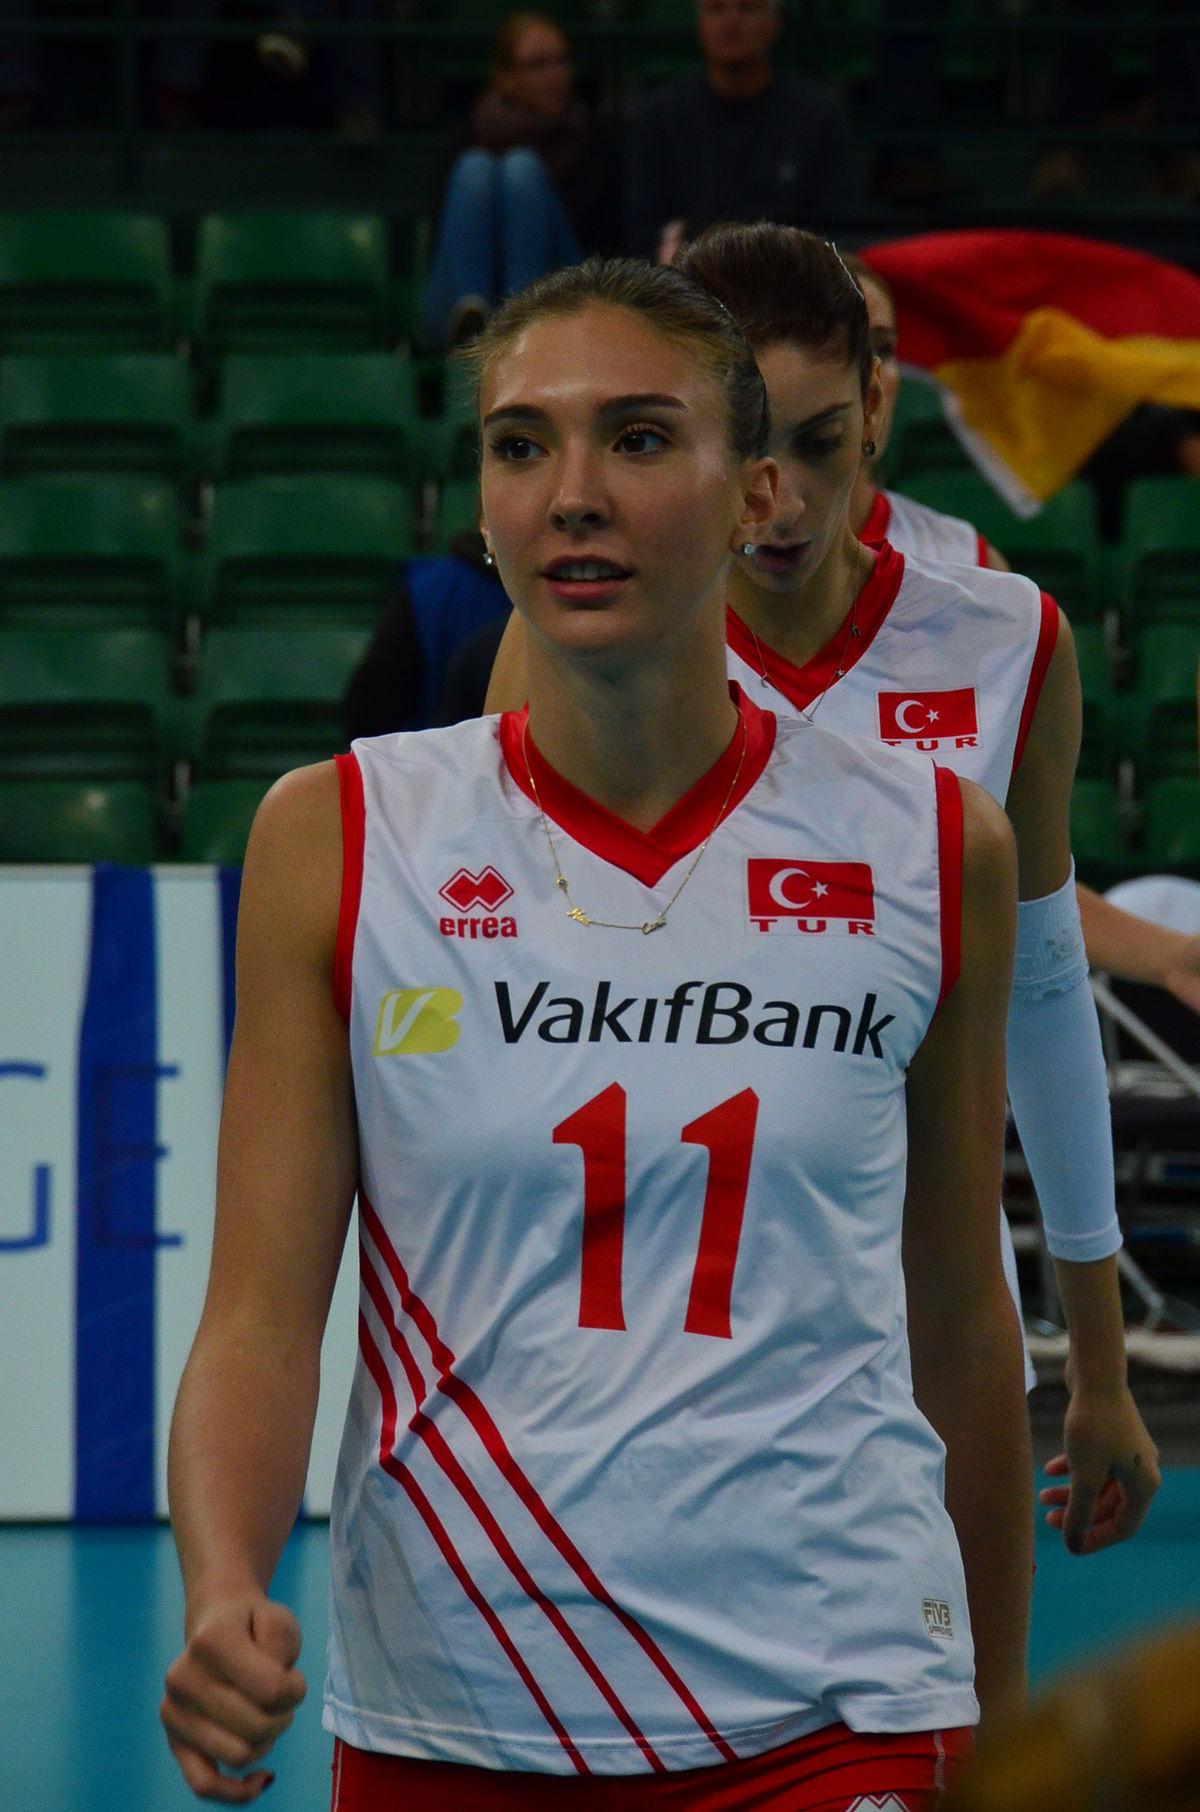 Volleyball Em Spiel Dt Bcrkei By Olaf Kosinsky Voleybol Vikipediya